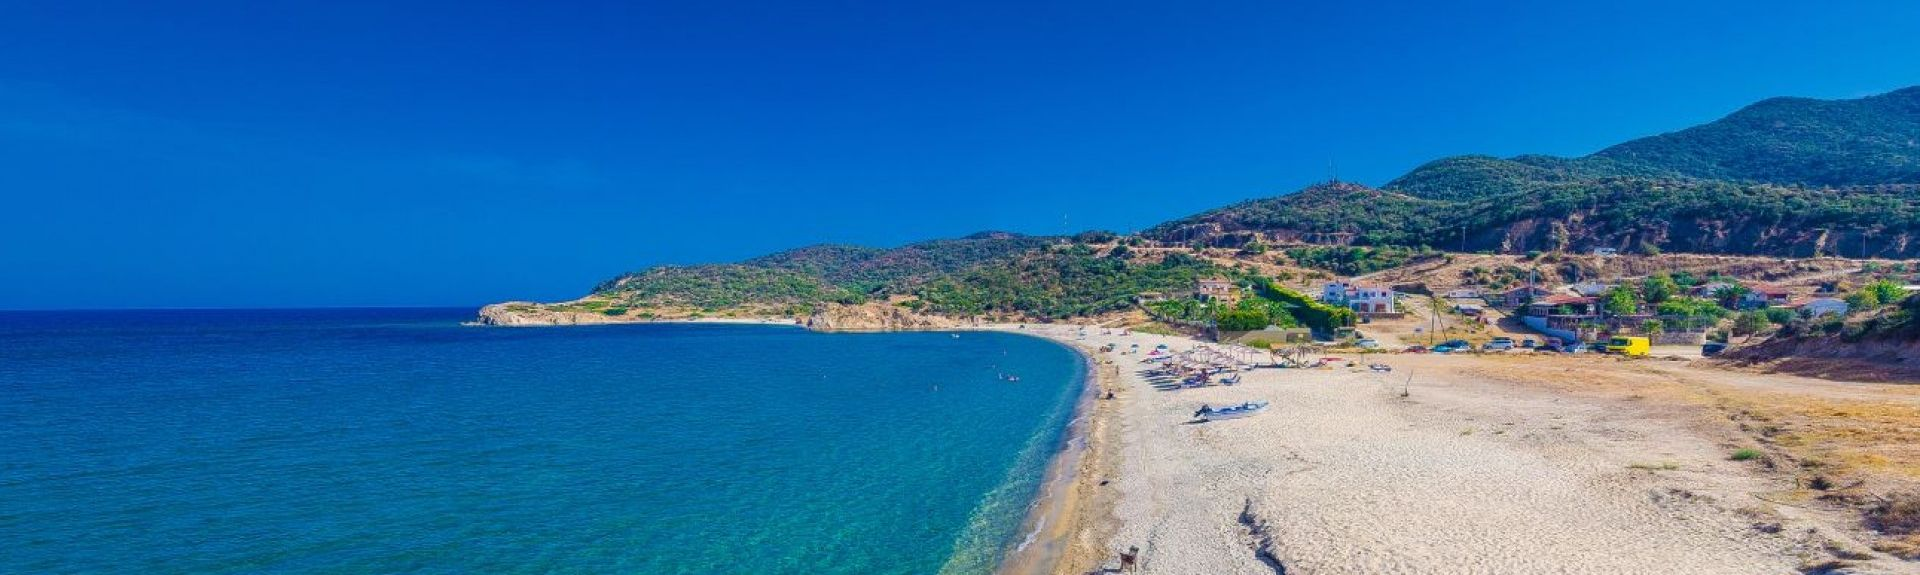 Nikiti Beach, Sithonia, Greece